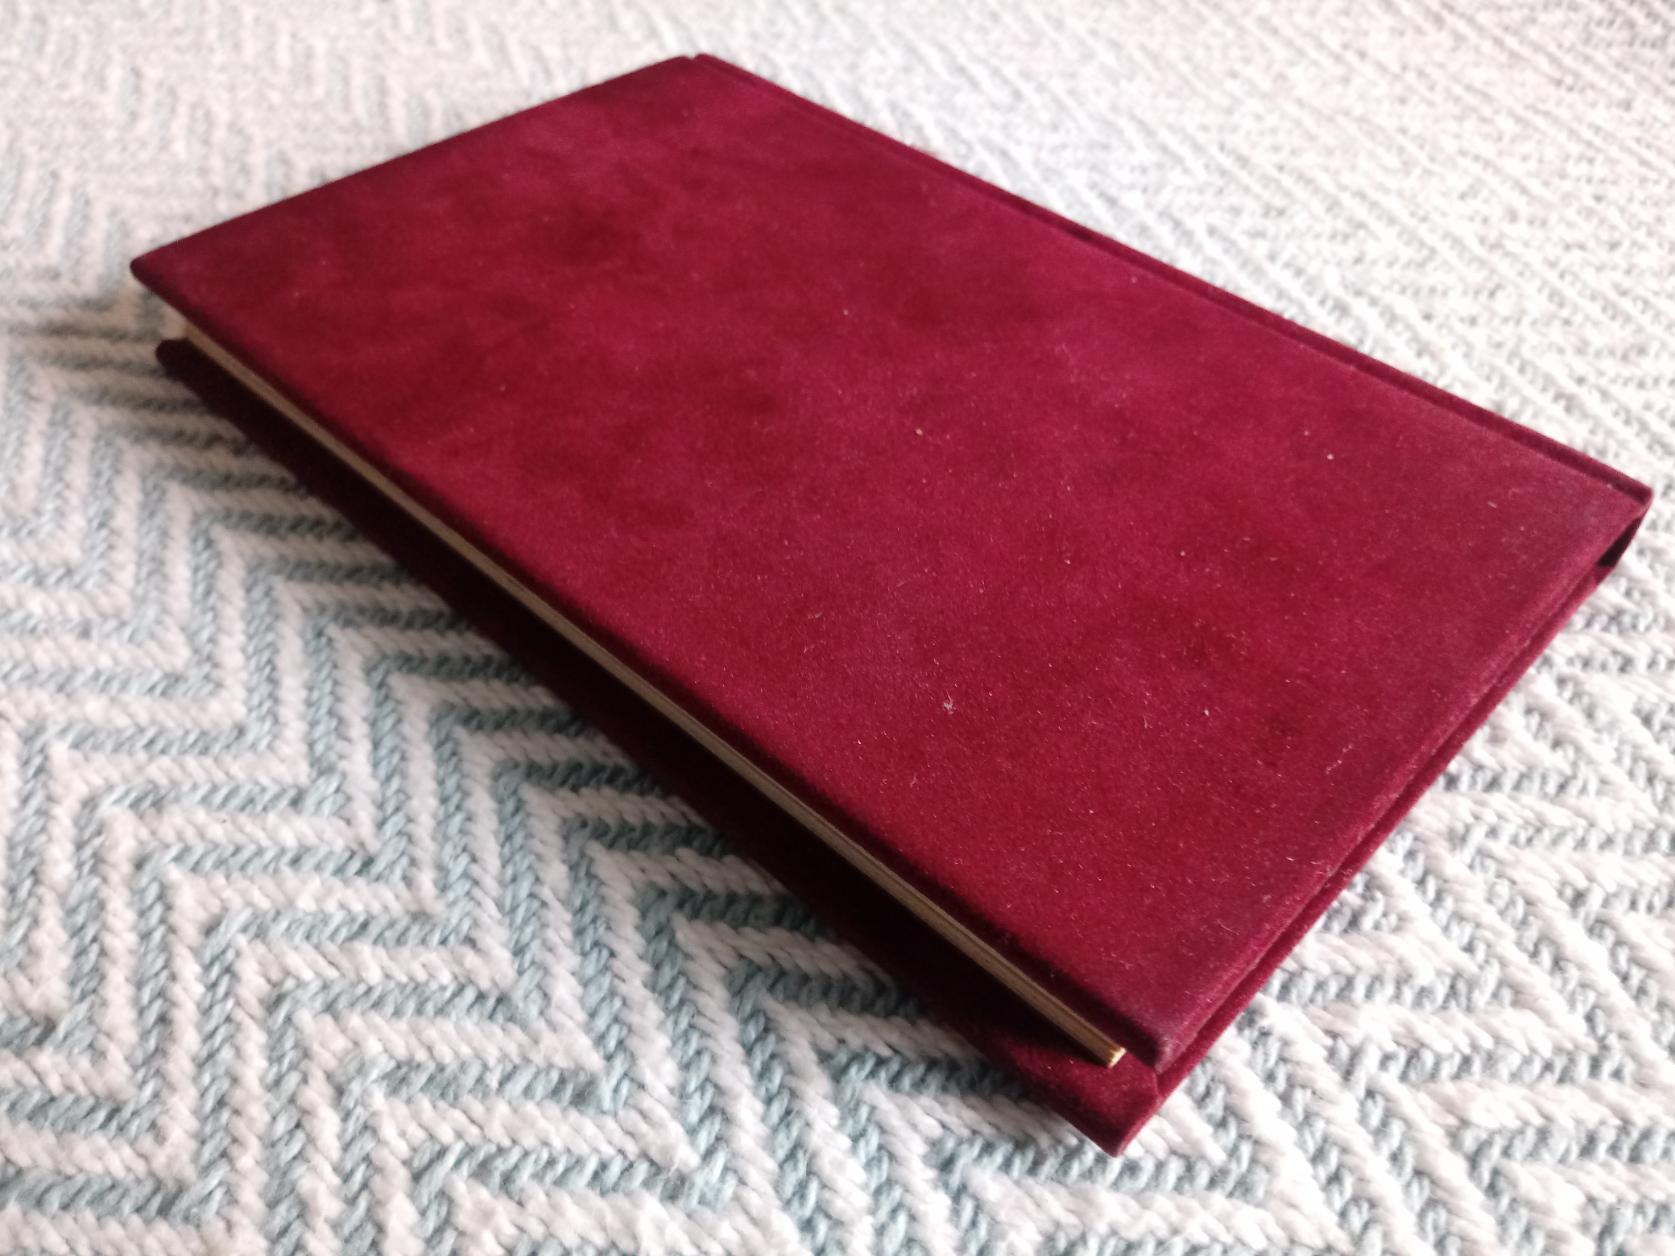 Love A Celebration Edited by Helen Exley velvet covered hardback book Published 1981 Exley - Image 2 of 3